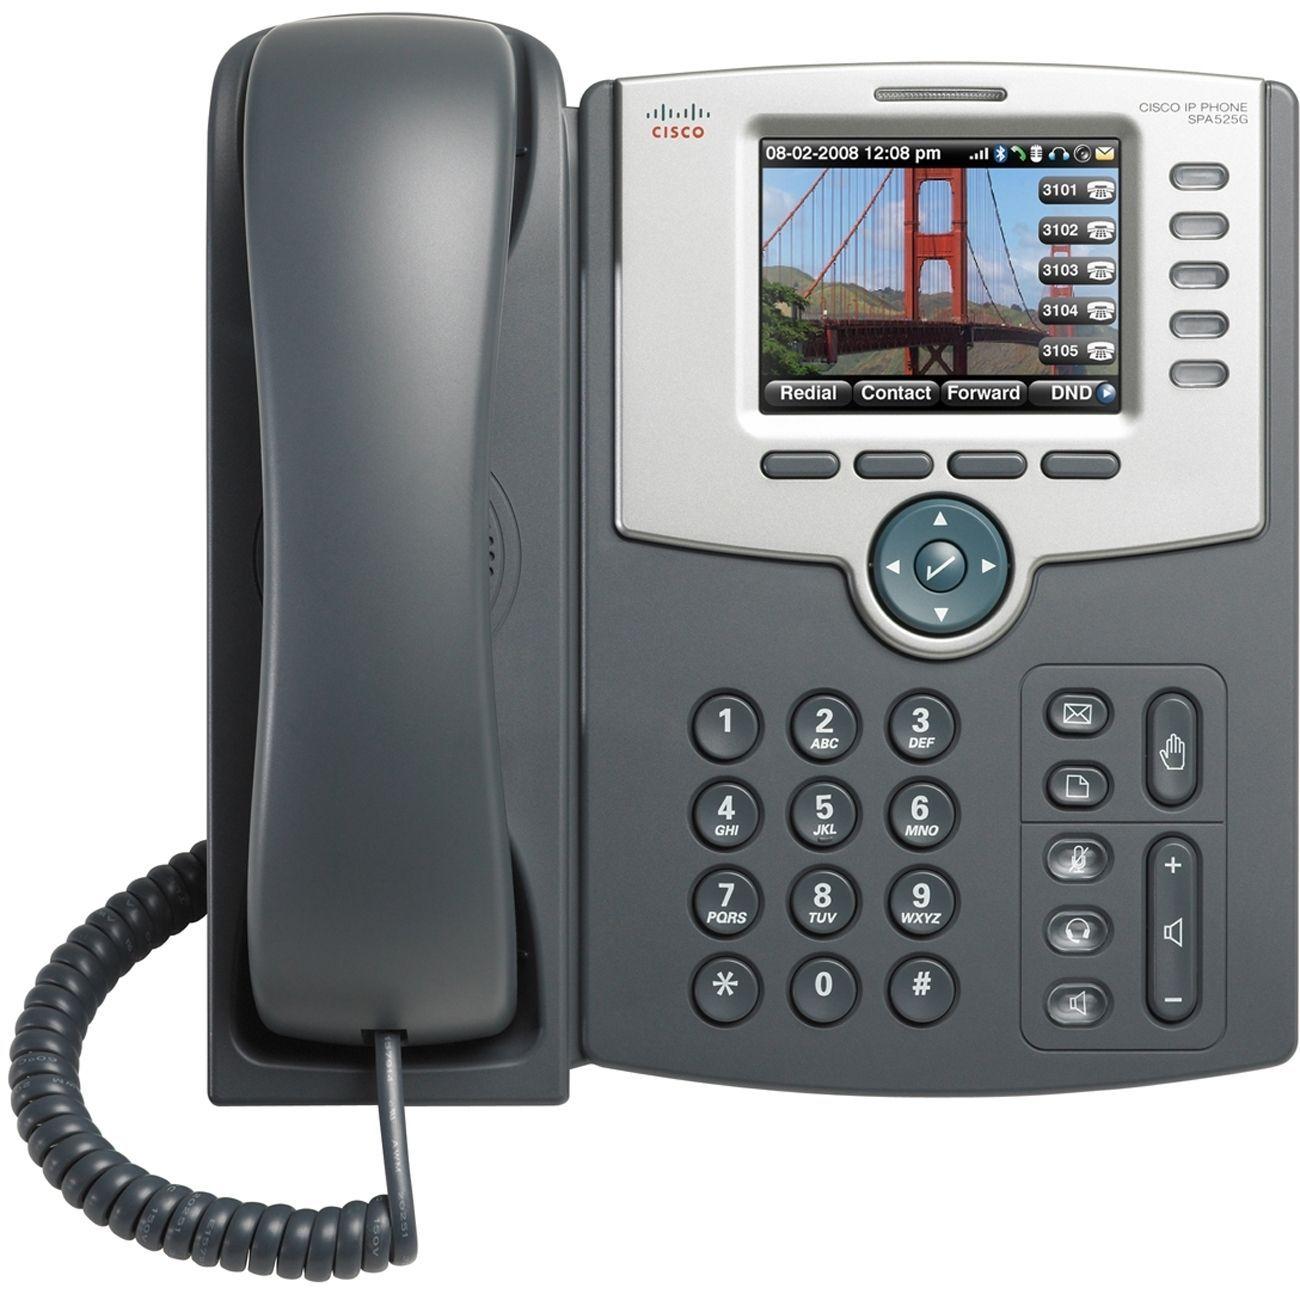 Cisco SPA525G2 IP Phone - Wireless - Wi-Fi